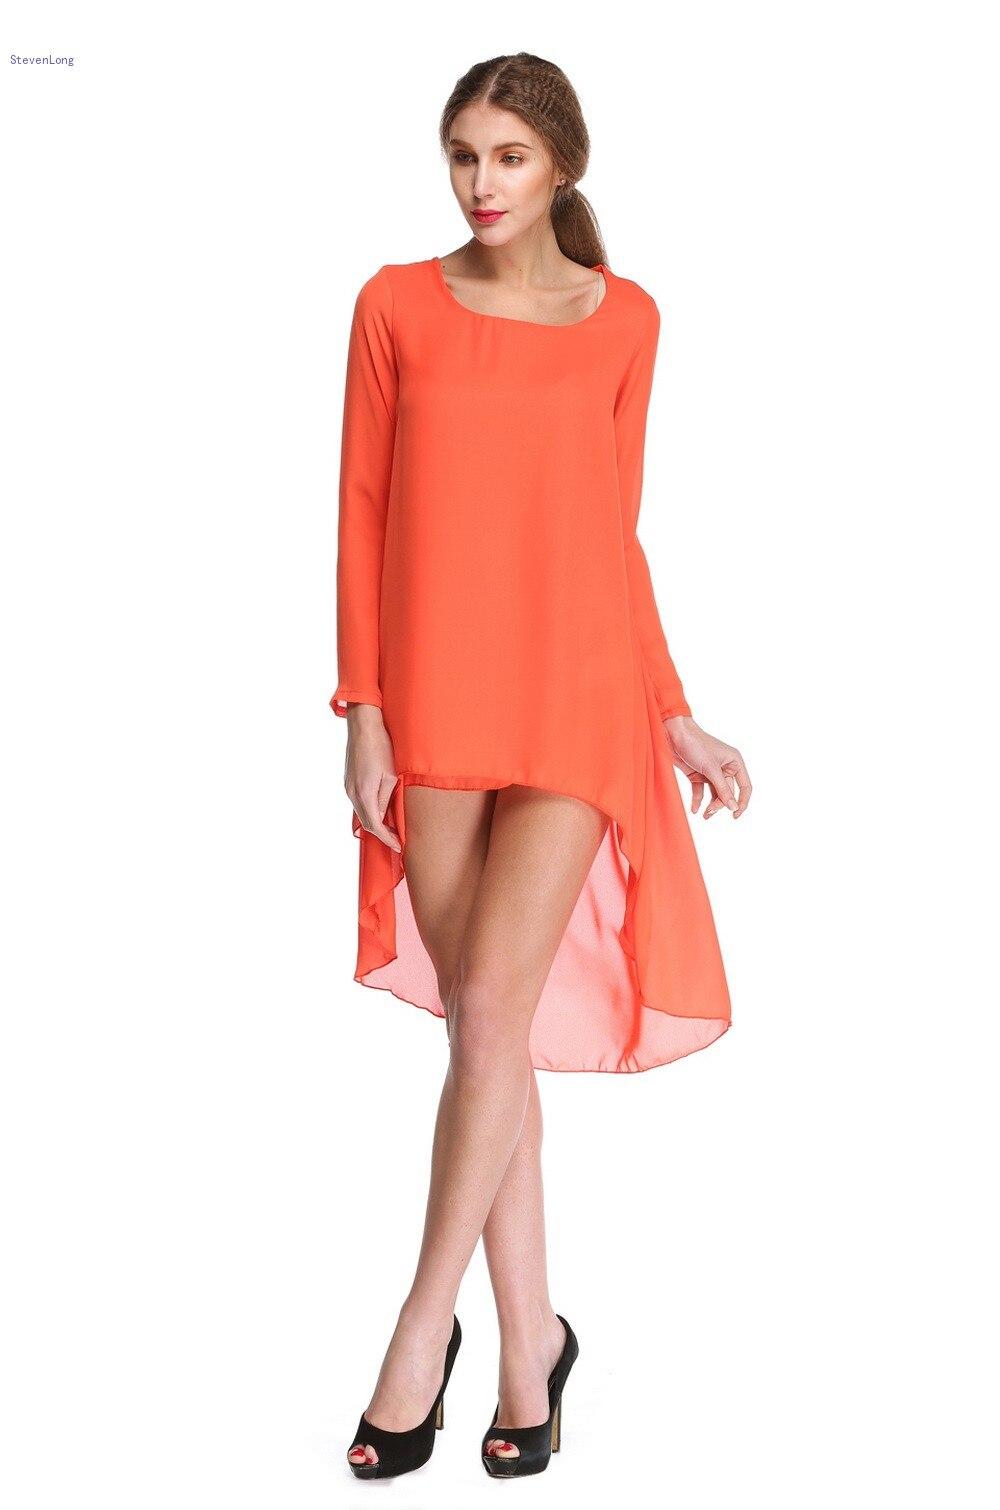 Fashion Dresses Accessories: New Fashion 2015 Women Chiffon Dress Long Sleeves Orange